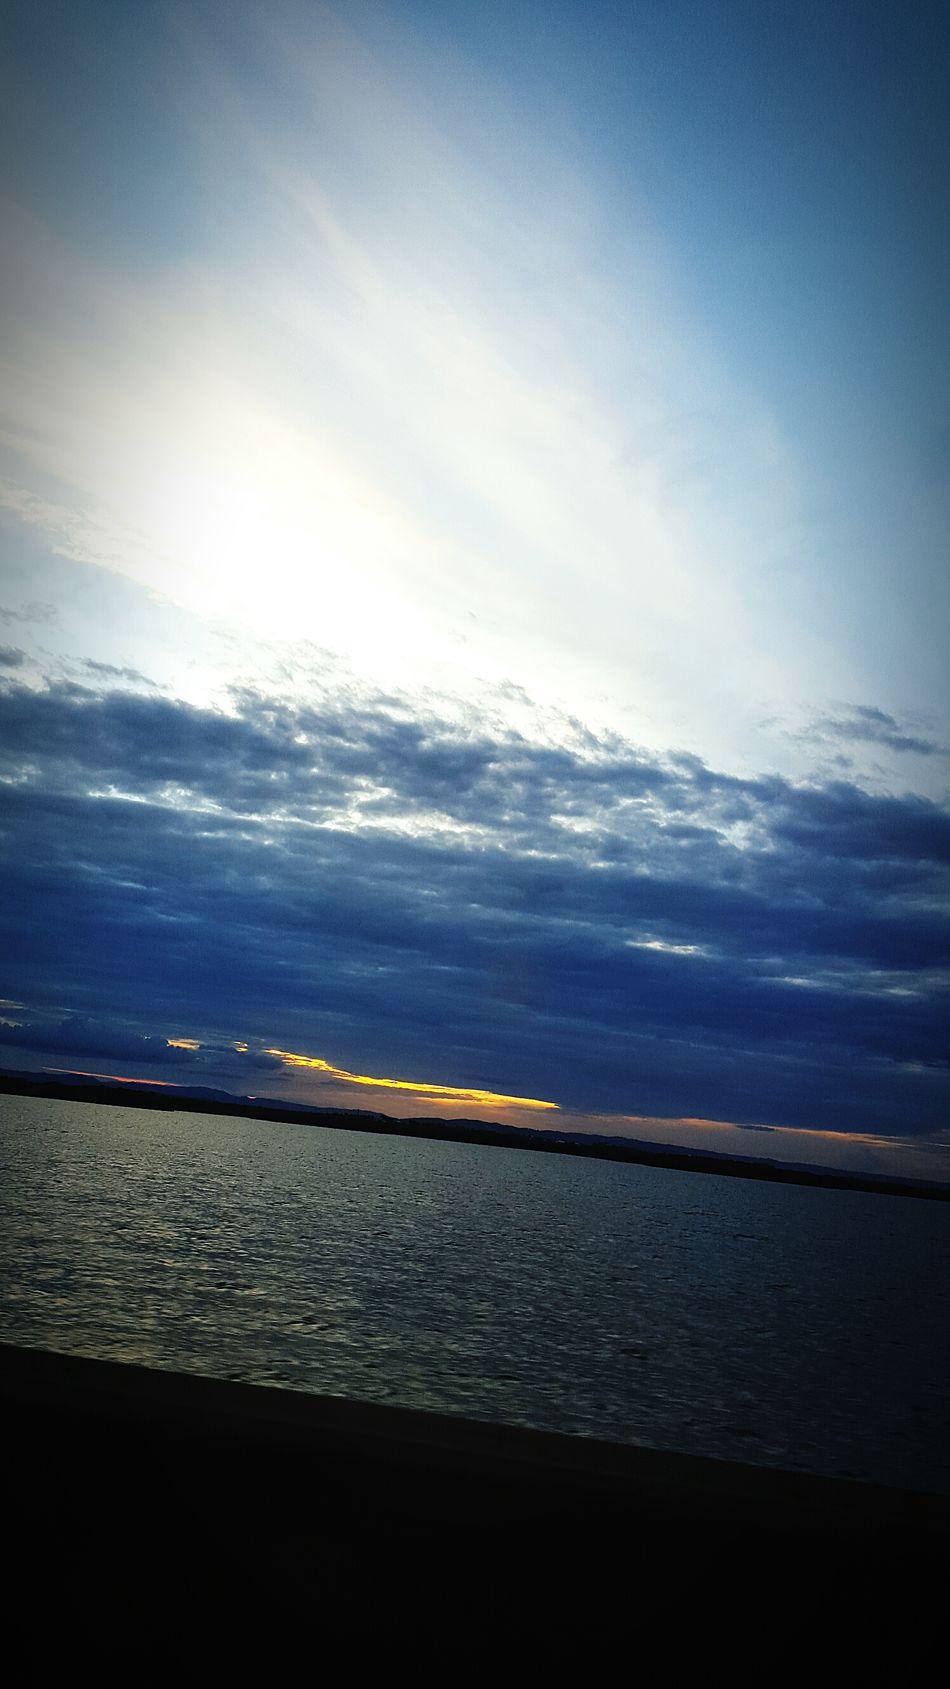 EymEm Nature Lovers Sky &water Driving Home Over The Bridge Lovely Sky Sunset Love Love Love.♥♥♥